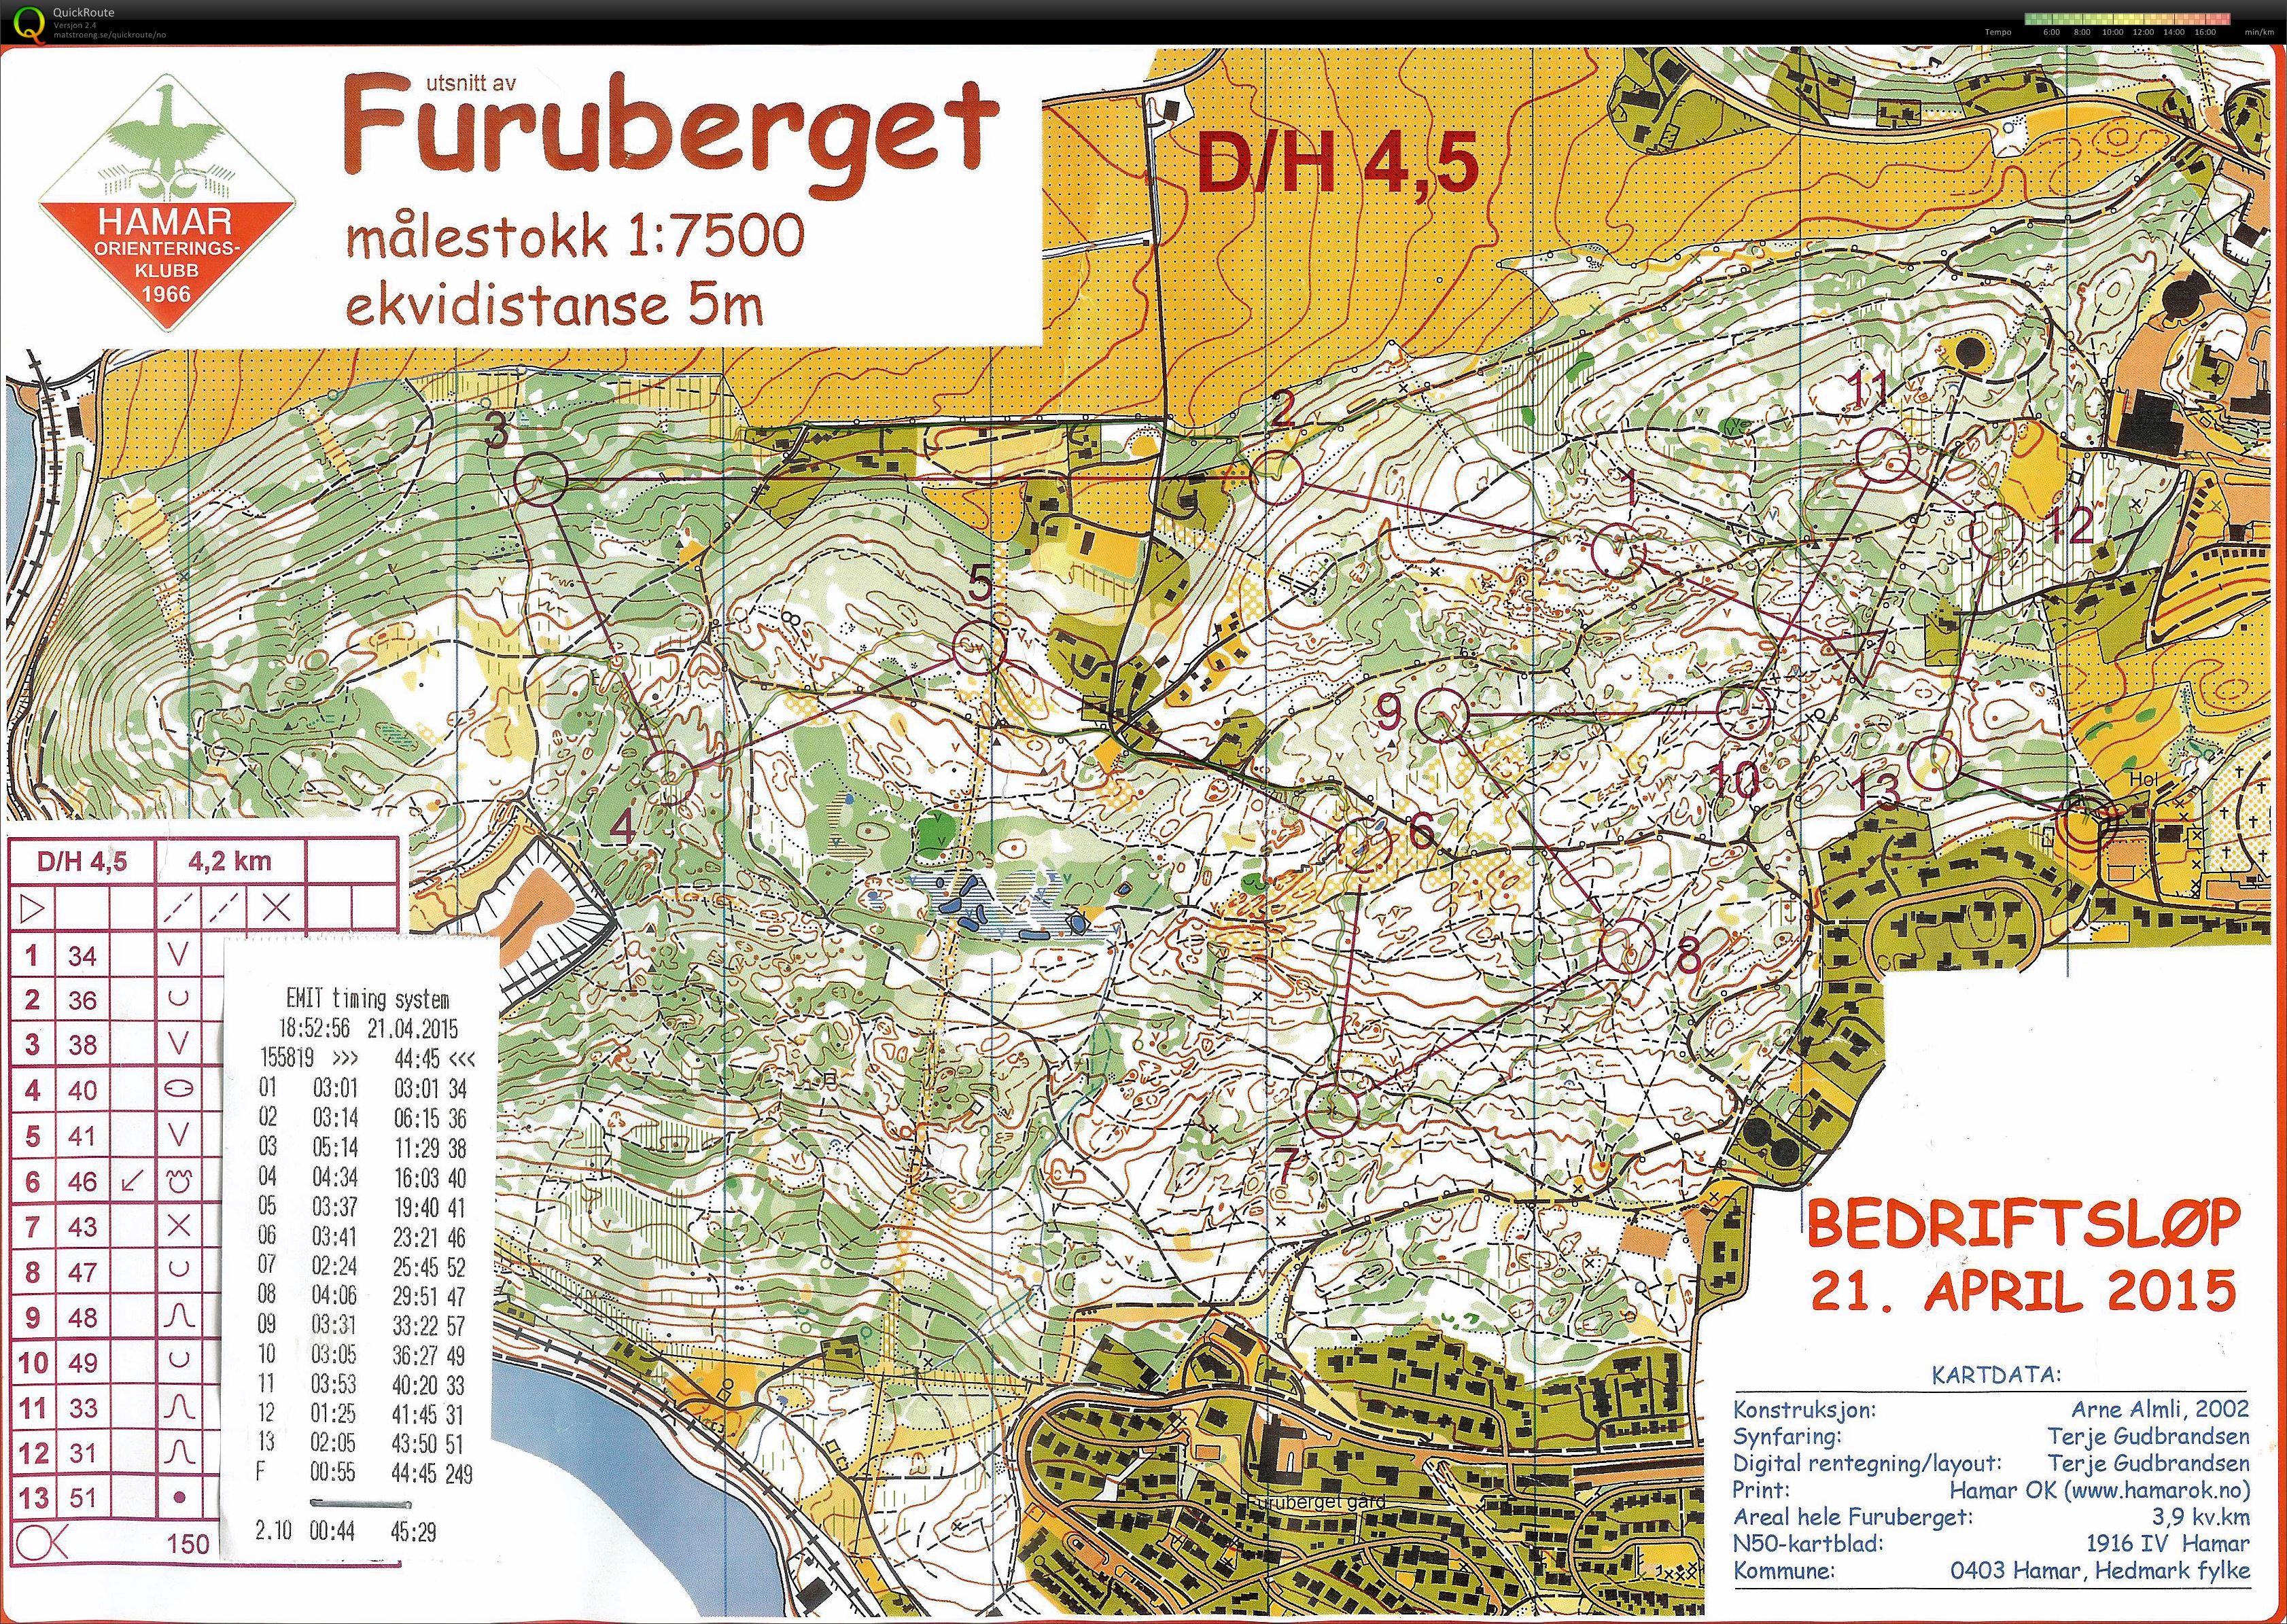 furuberget kart Mitt digitale kartarkiv meg gps tracking. :: Bedrifts o løp  furuberget kart